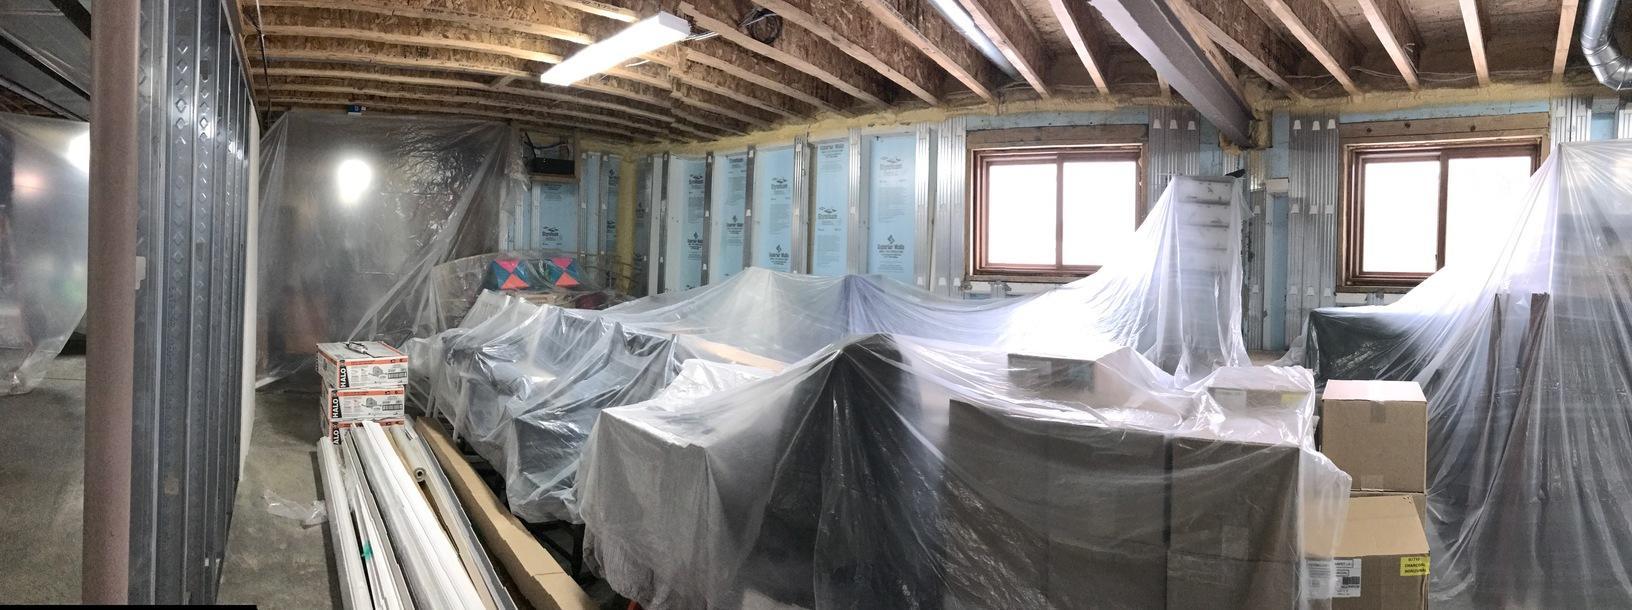 Full Basement Finishing in East Aurora, NY - Before Photo